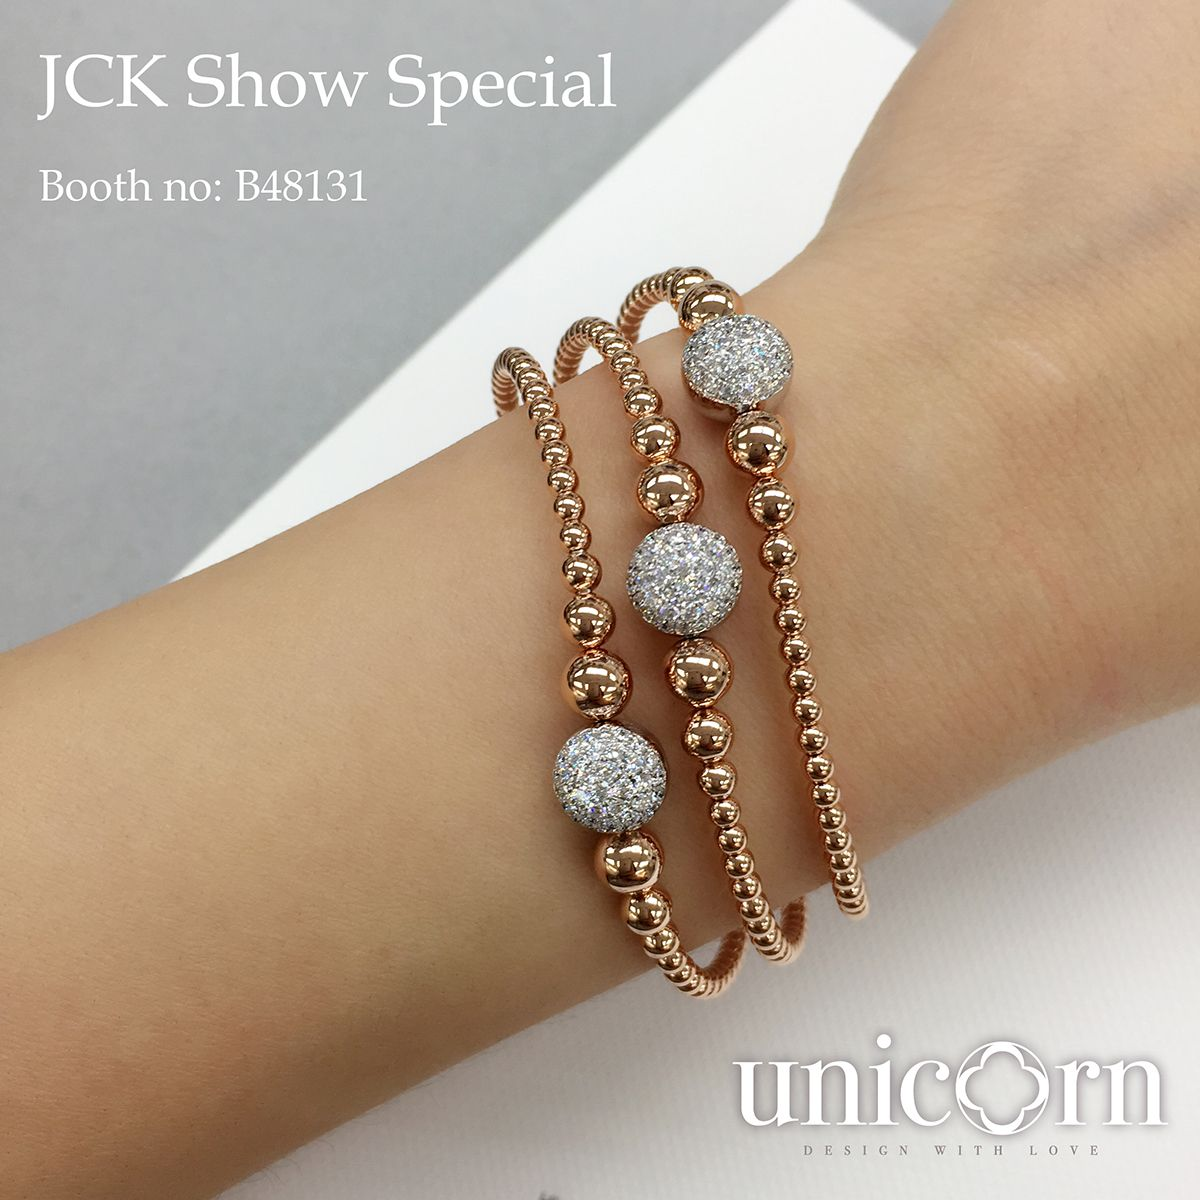 Unicorn Jewelry Design Co Ltd Booth NoB48131 FineJewelry JCK